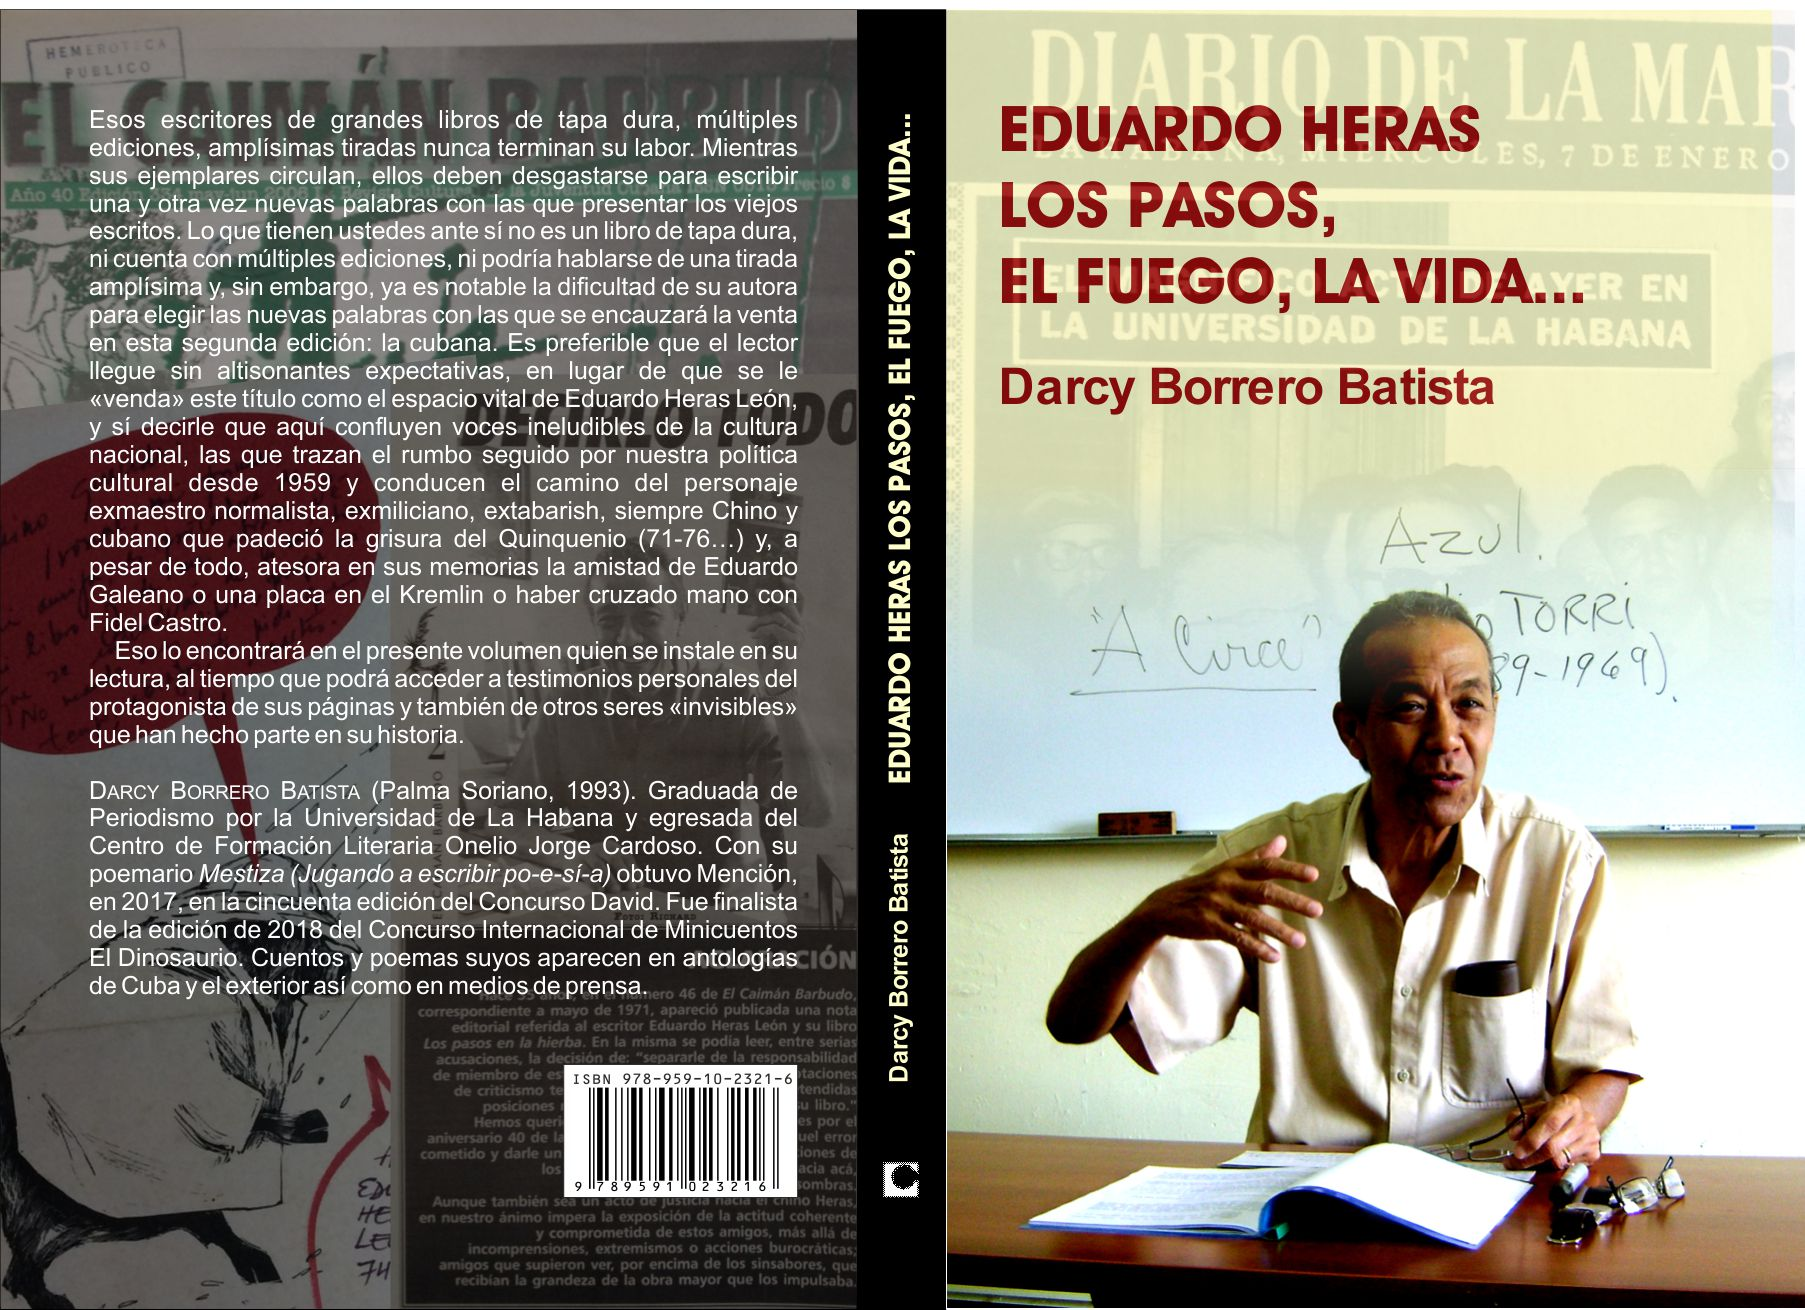 EDUARDO HERAS LOS PASOS CUBIERTA 1